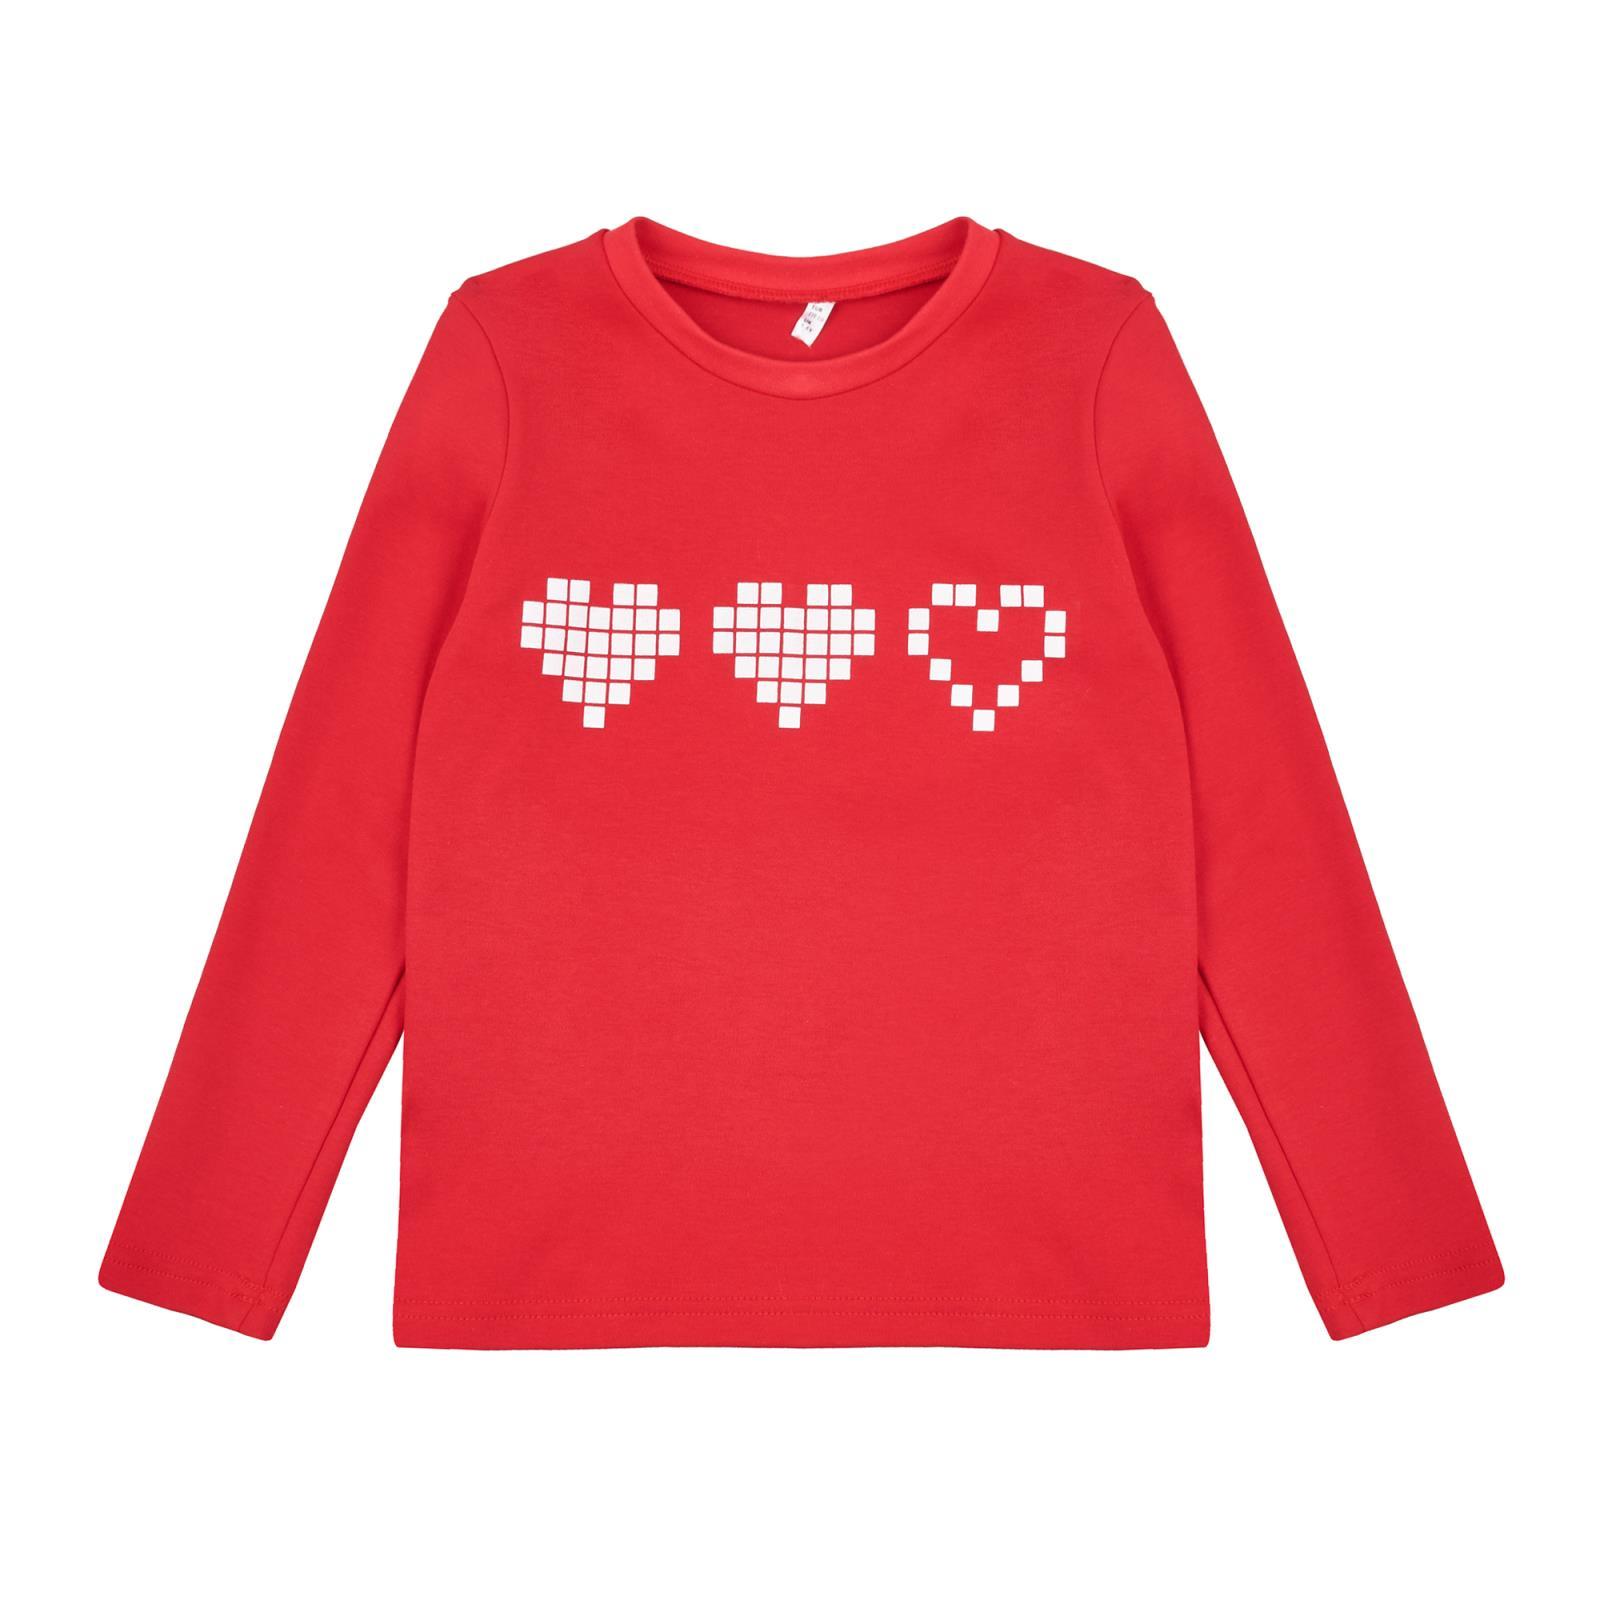 Реглан детские O! Kids Clothing модель OKC~96327-1 , 2017